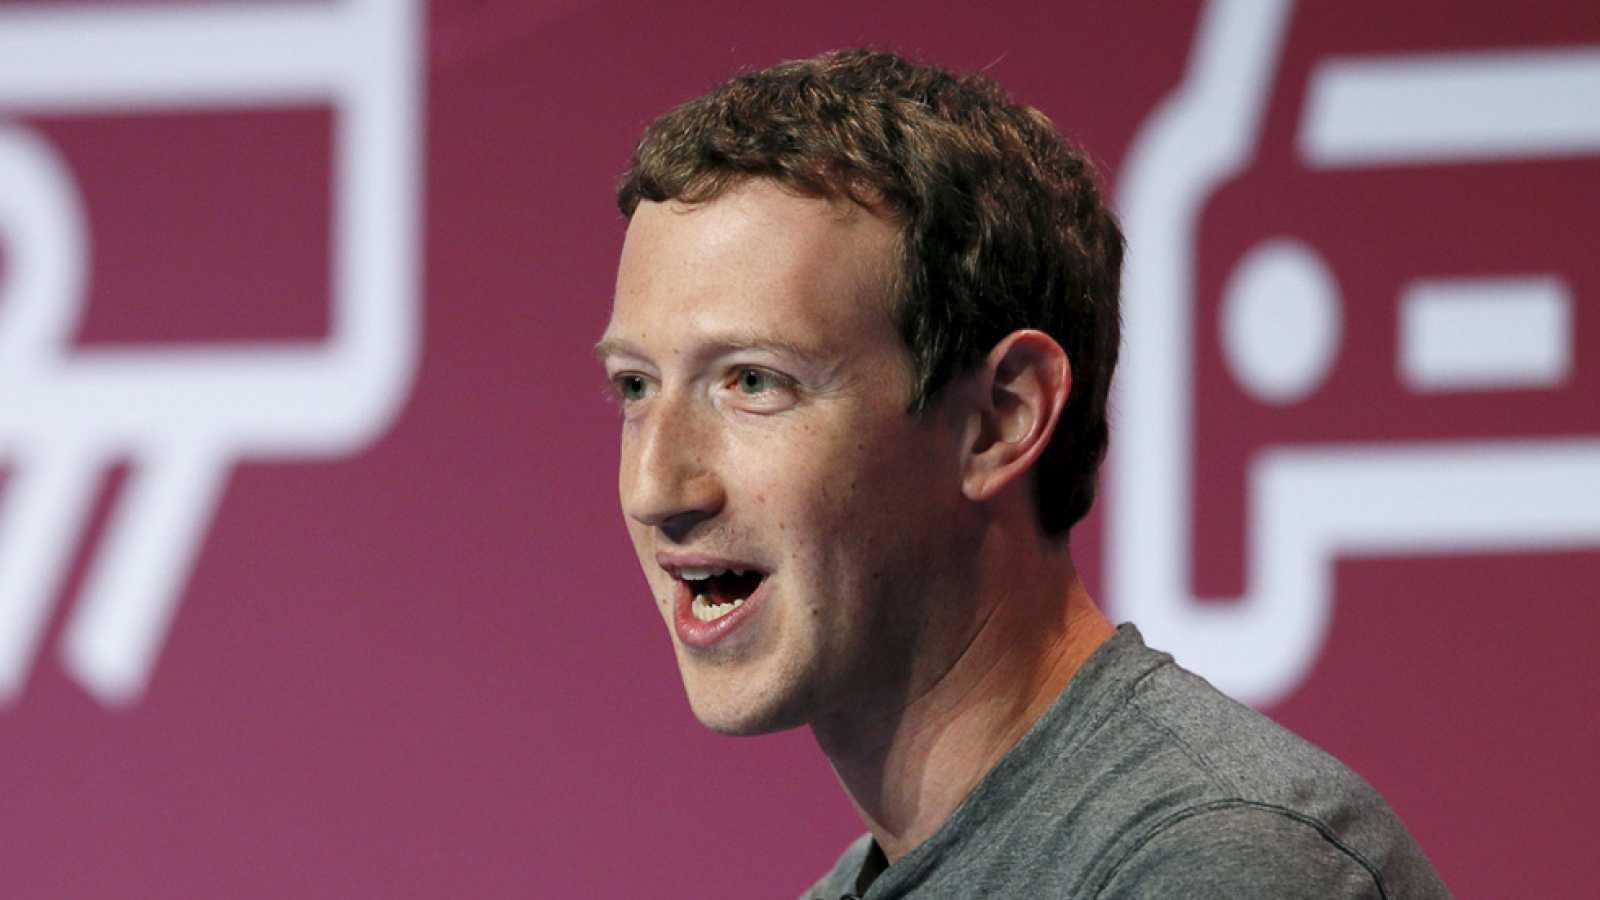 Mark Zuckerberg genera mucha expectación entre los asistentes al Mobile World Congress